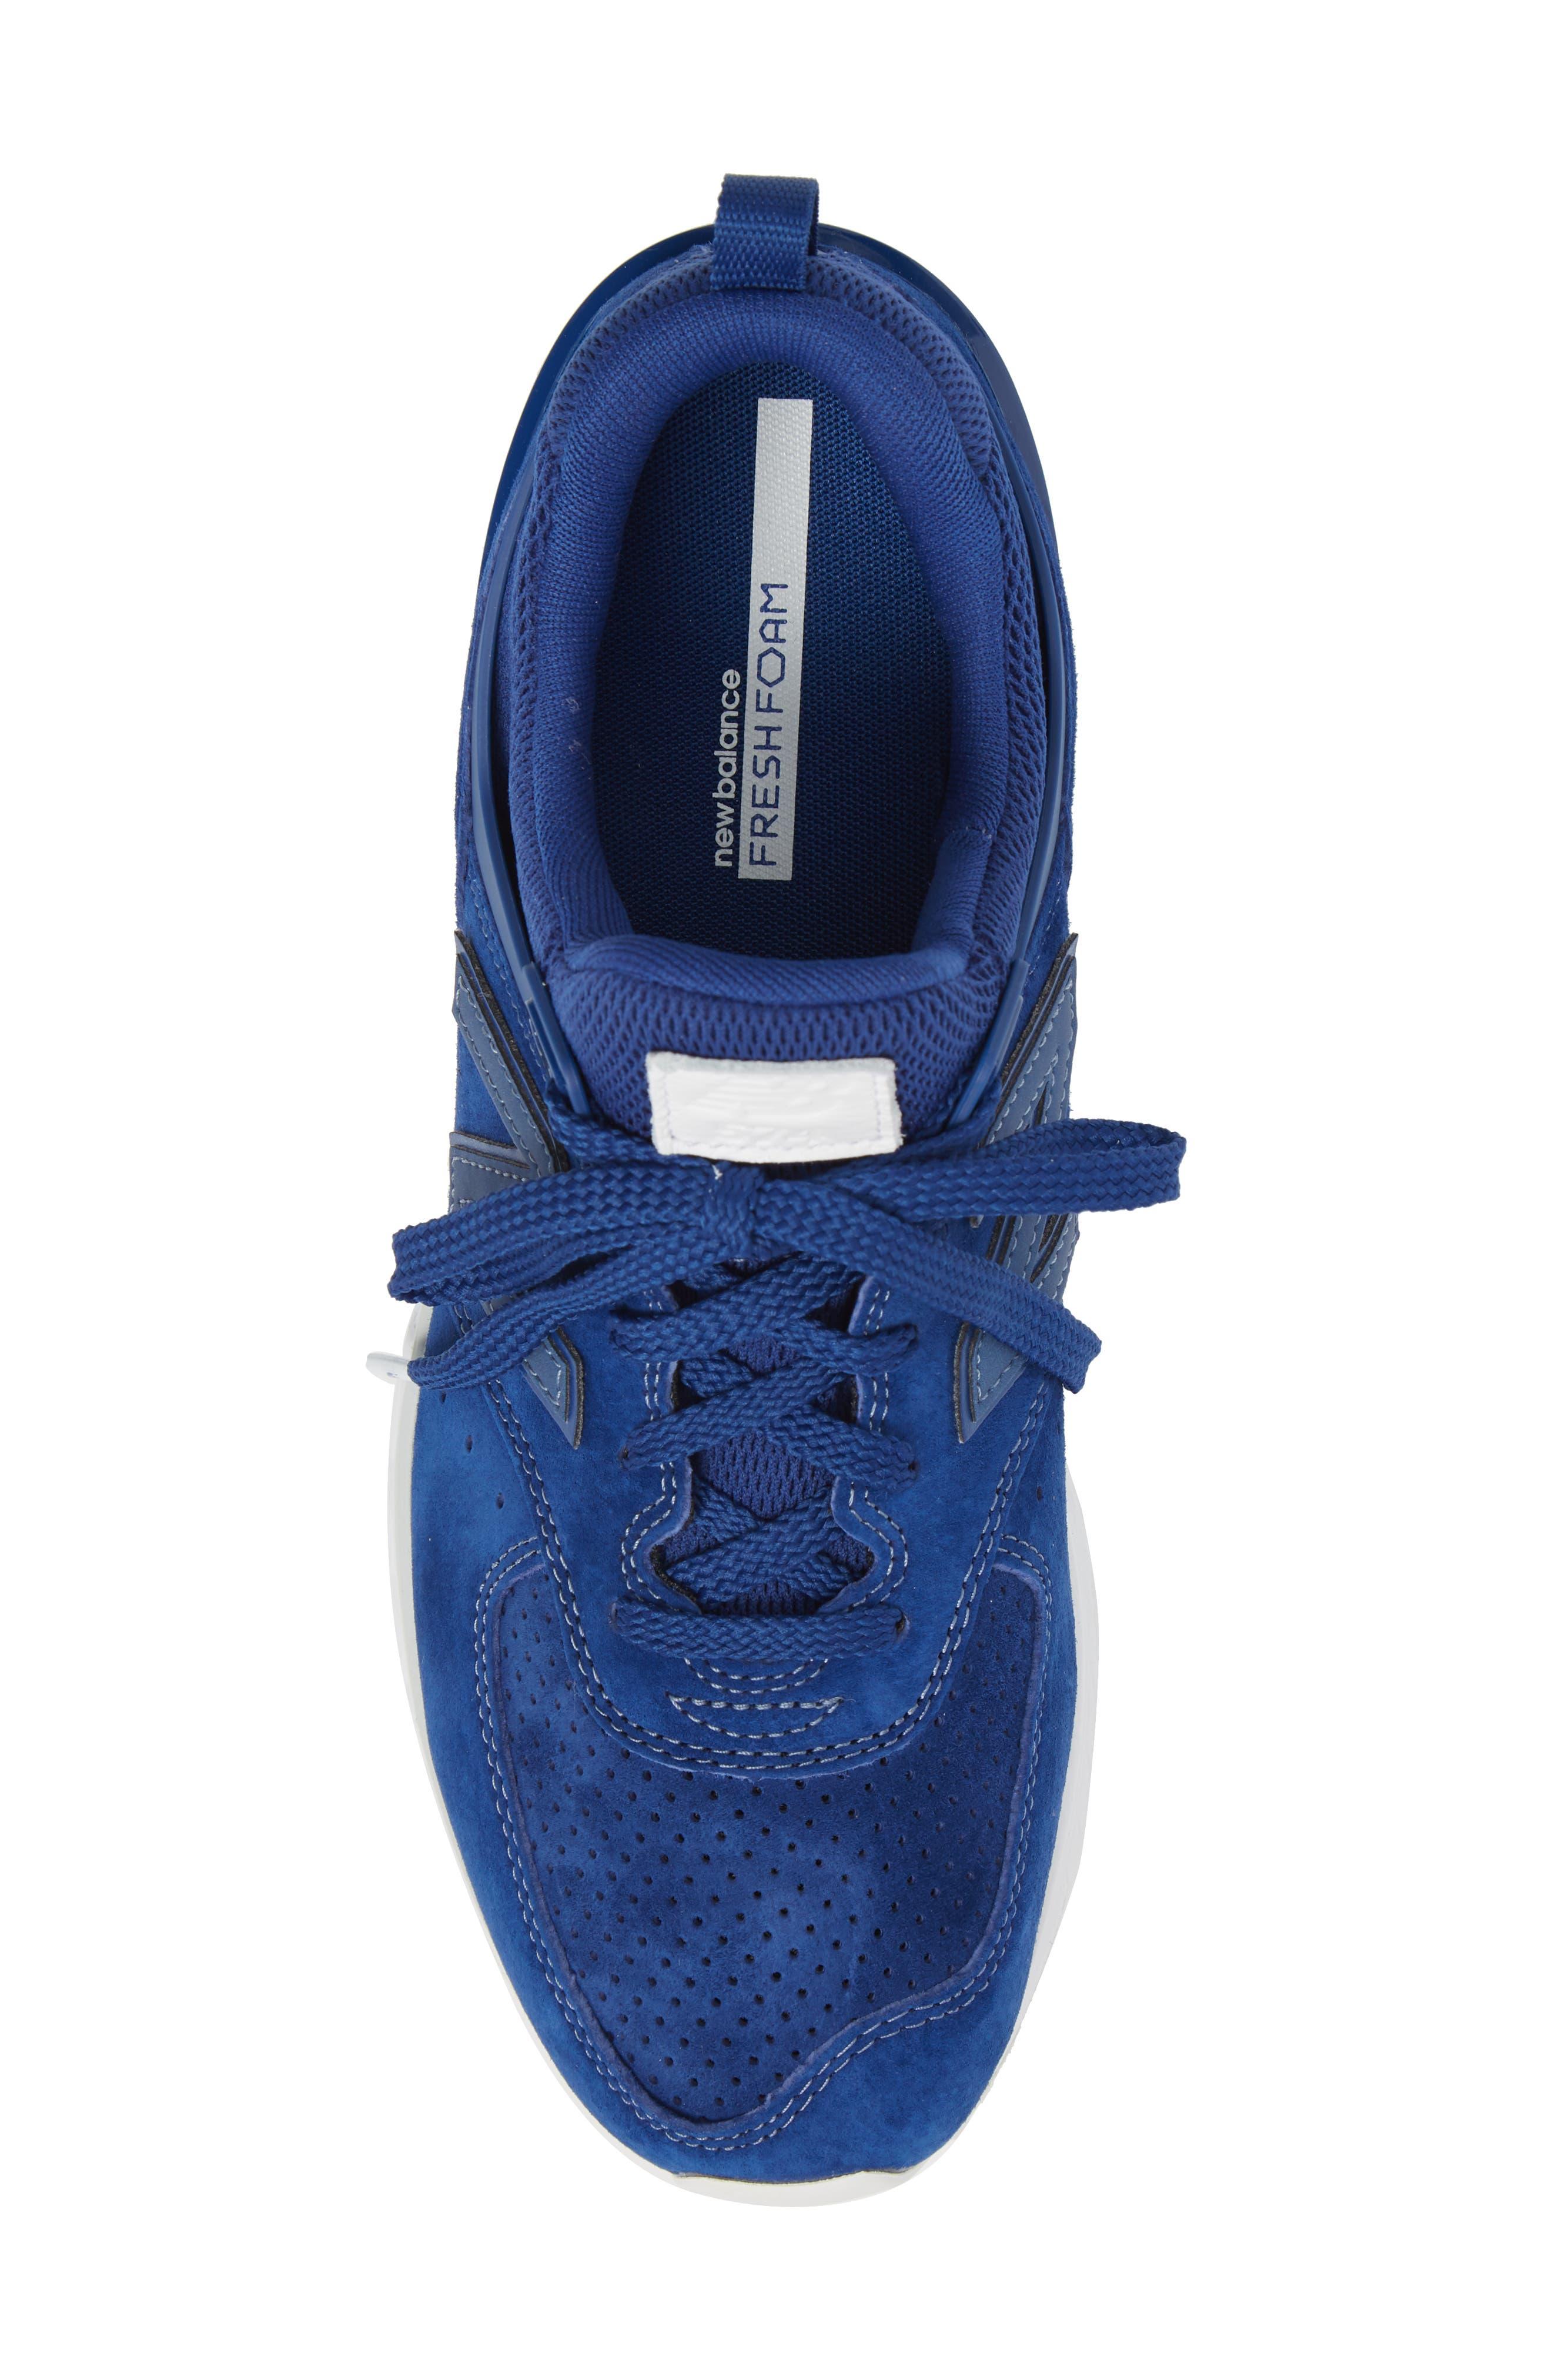 574 Sport Sneaker,                             Alternate thumbnail 5, color,                             Atlantic